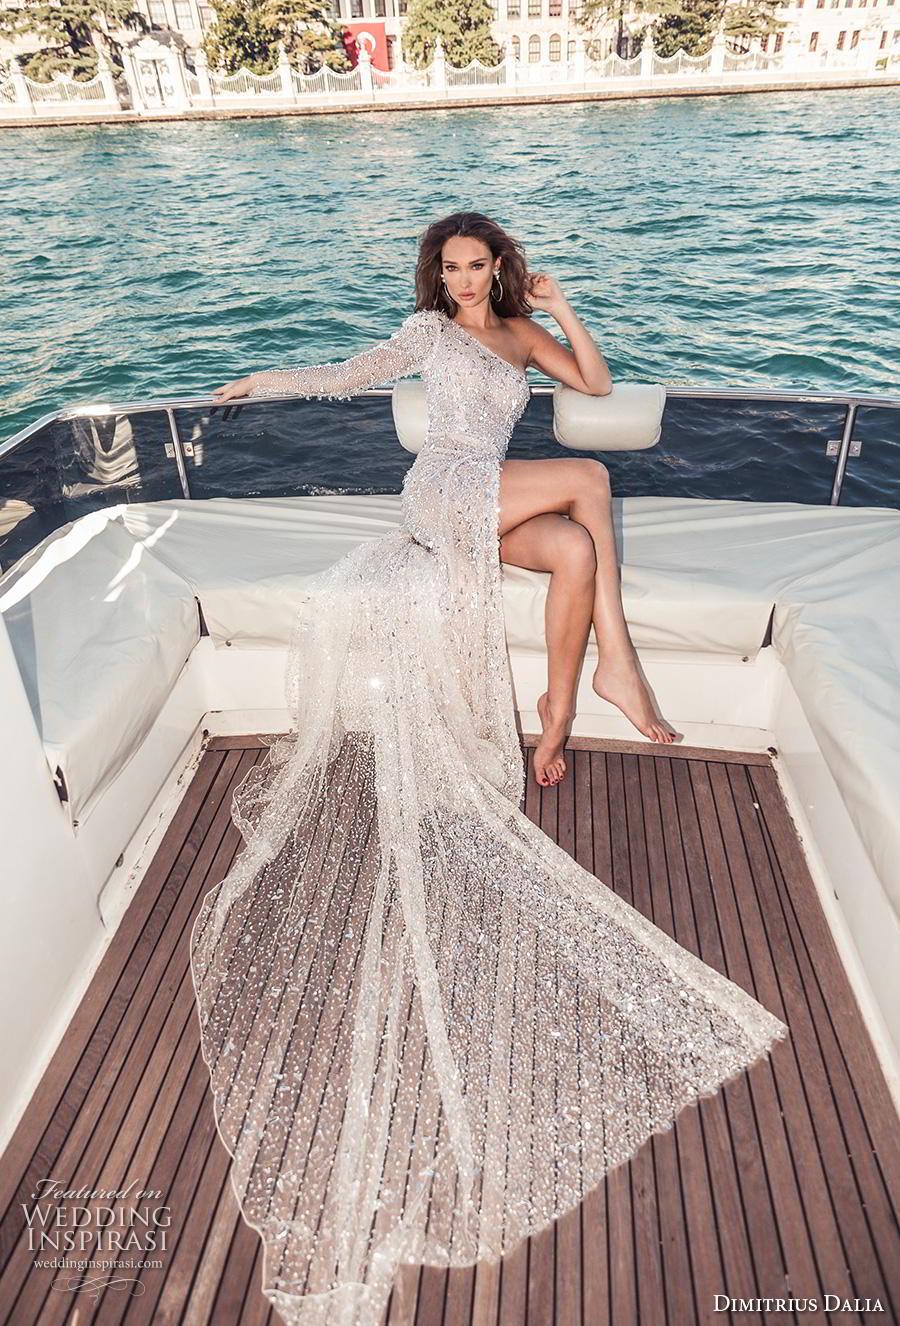 dimitrius dalia 2019 bridal long sleeves one shoulder full embellishment high slit skirt glitter glamorous soft a  line wedding dress chapel train (16) mv